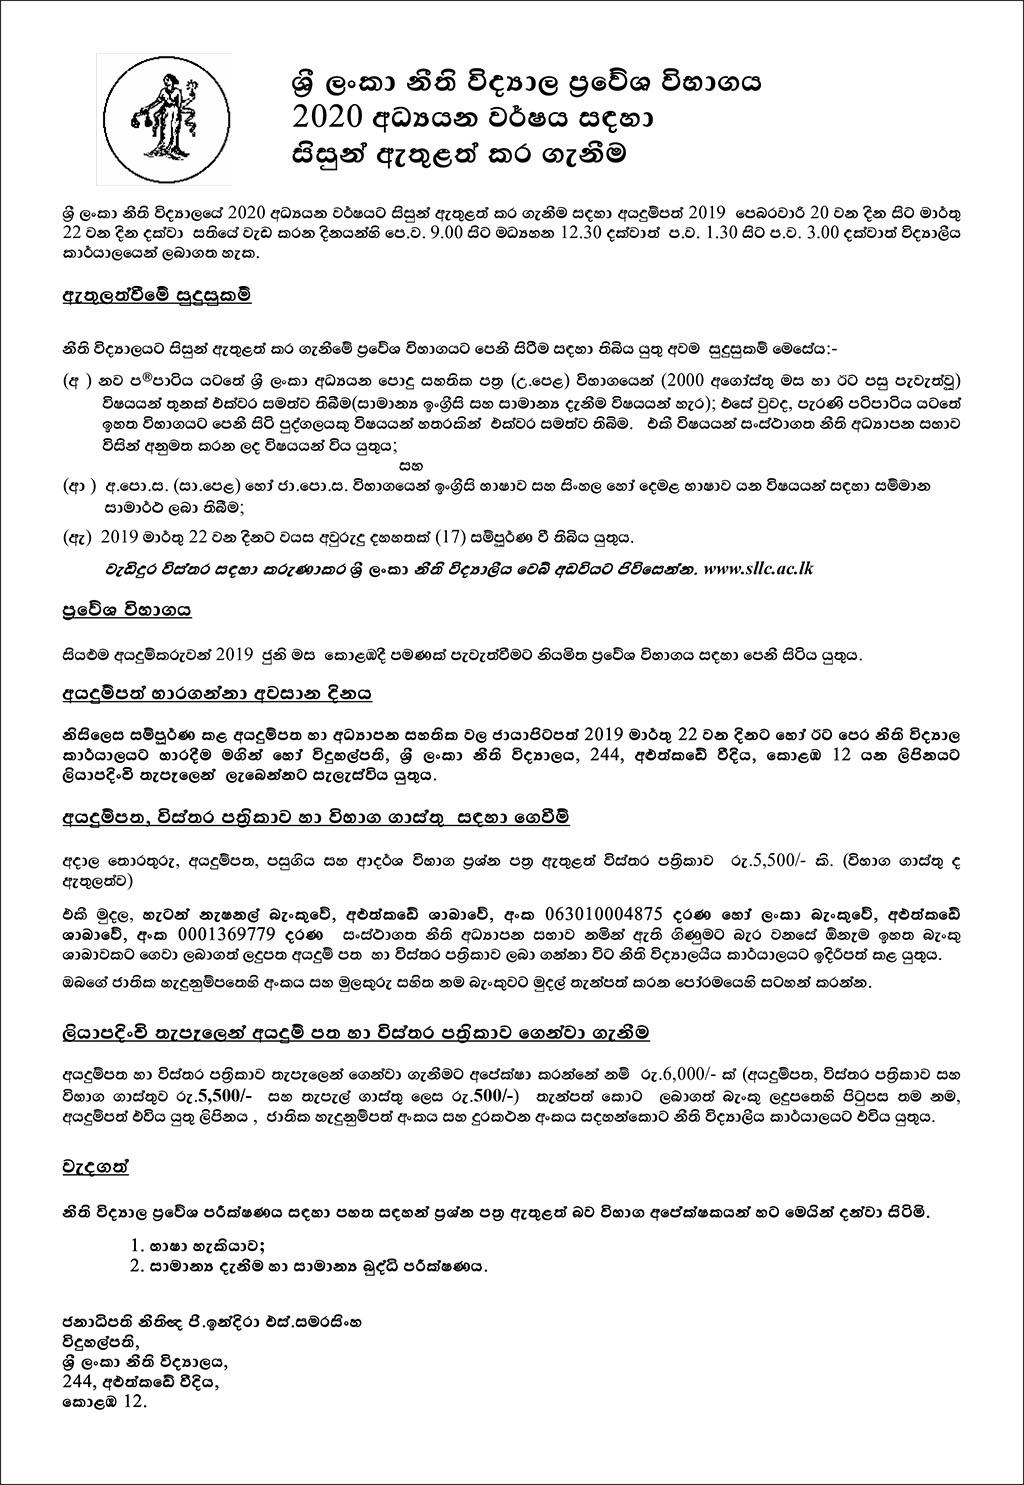 Application for Sri Lanka Law College Entrance Exam 2020